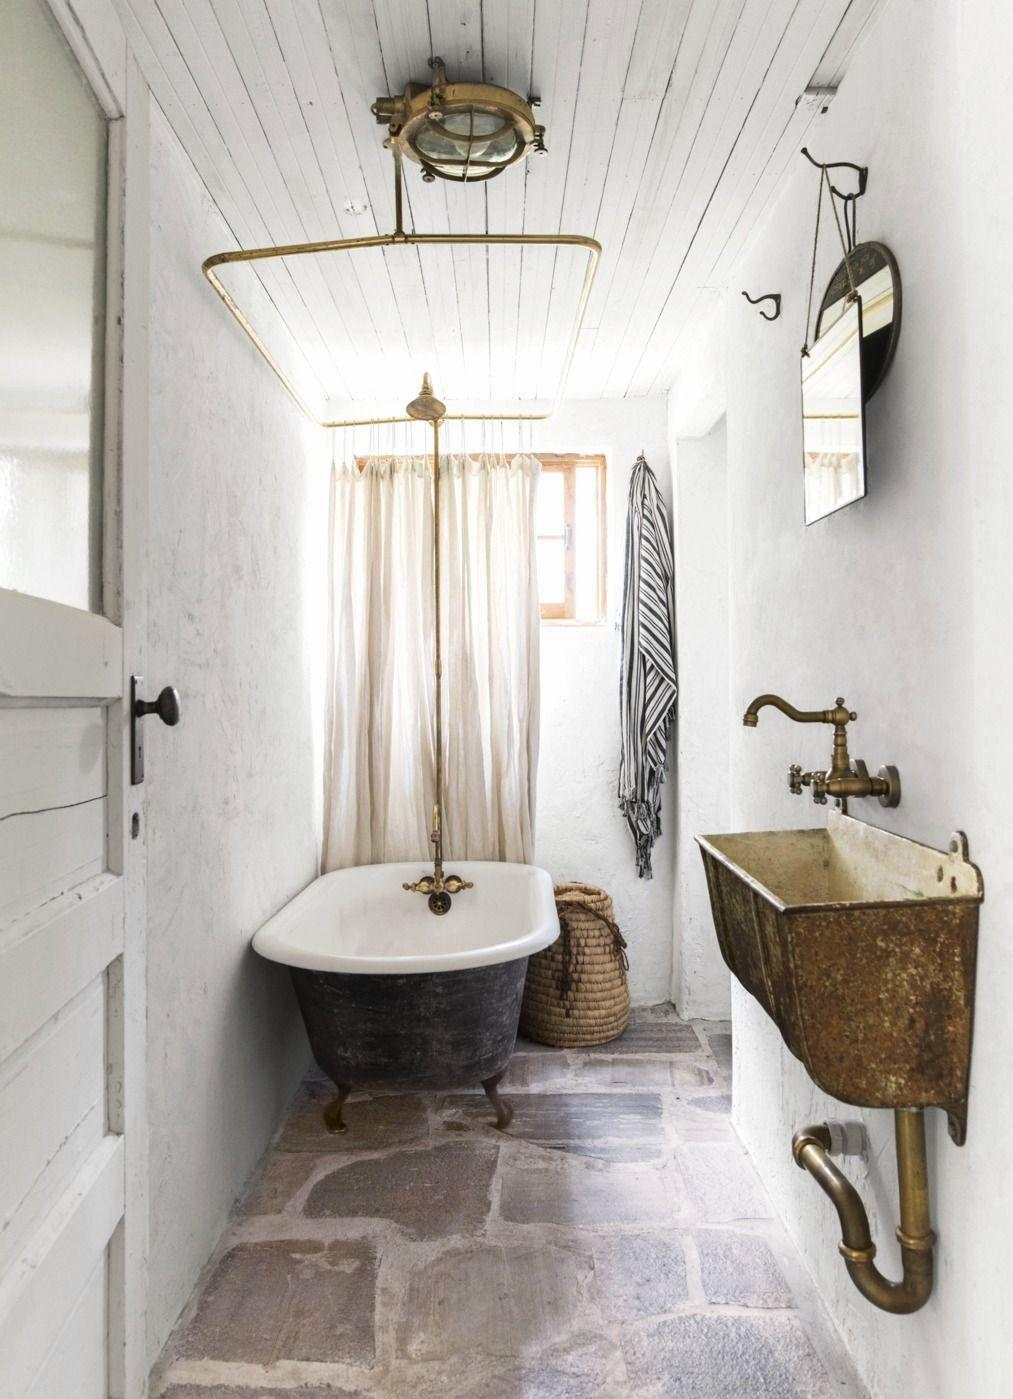 Cottage Style Bathroom Ideas Inspirational 100 Best Bathroom Decorating Ideas Decor Design In 2020 Bathroom Styling Bathroom Decor Bathroom Interior Design